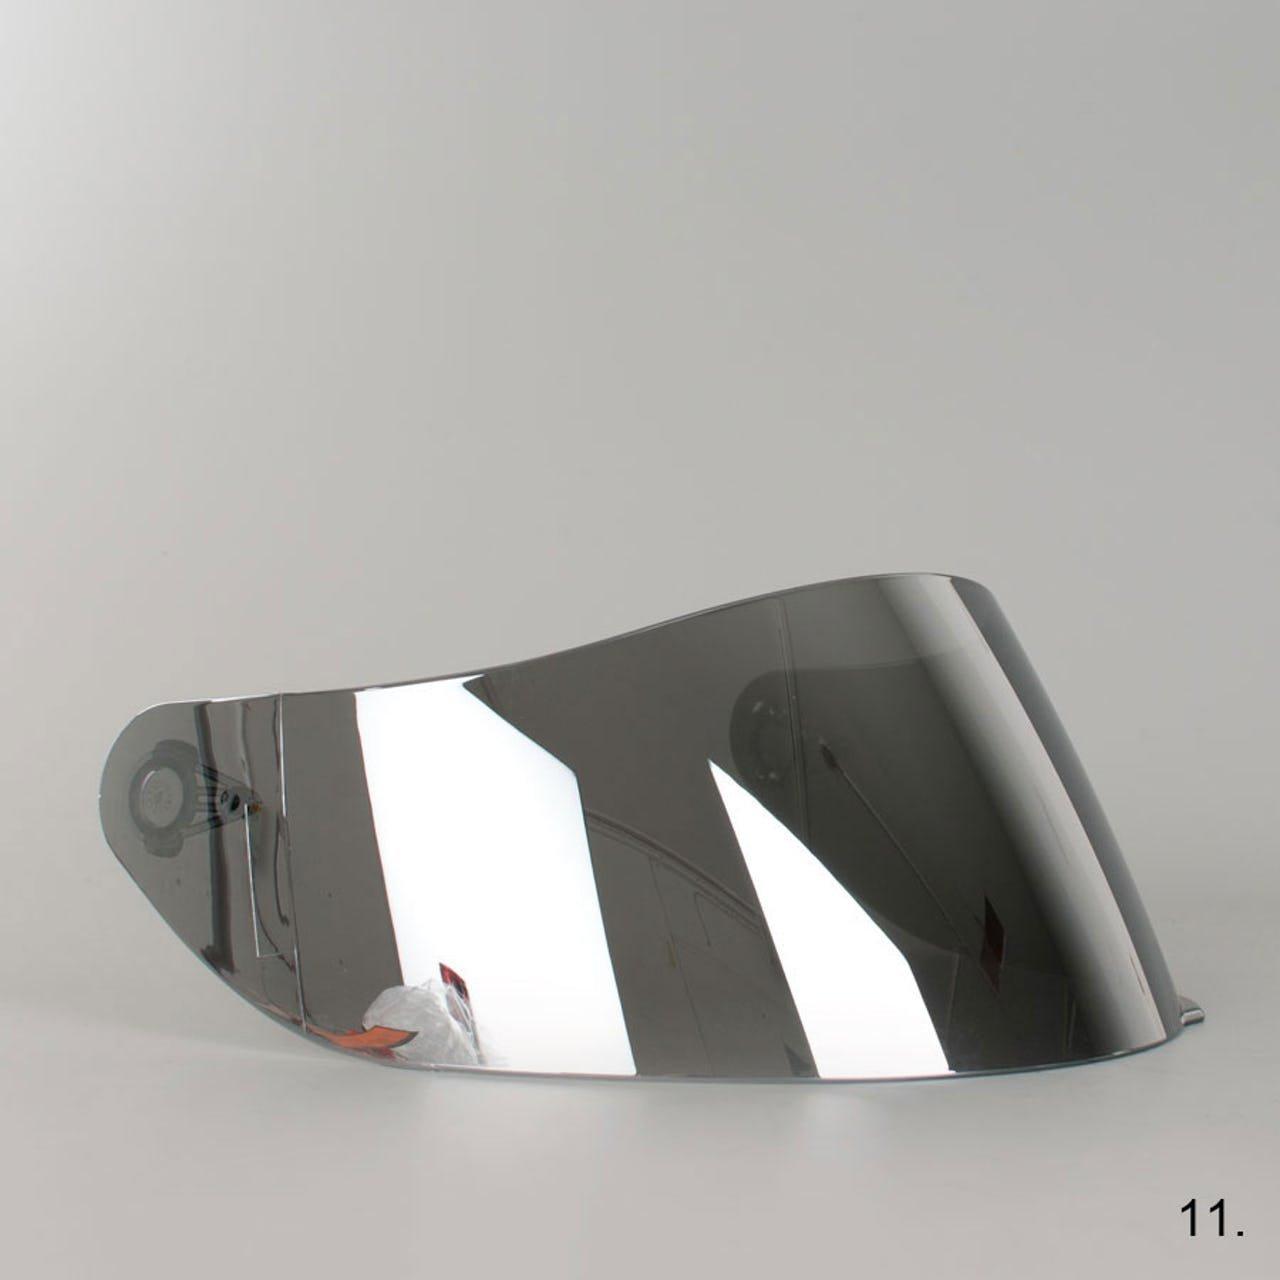 Visor Original Not Compatible AGV K3/SV K1/K5/K5-sv K5S Horizon Skyline Road NUMO GT-2/xxs-xs-s-ms-m-ml-l-xl-xxl TAGLIA UNICA Fume 50/%